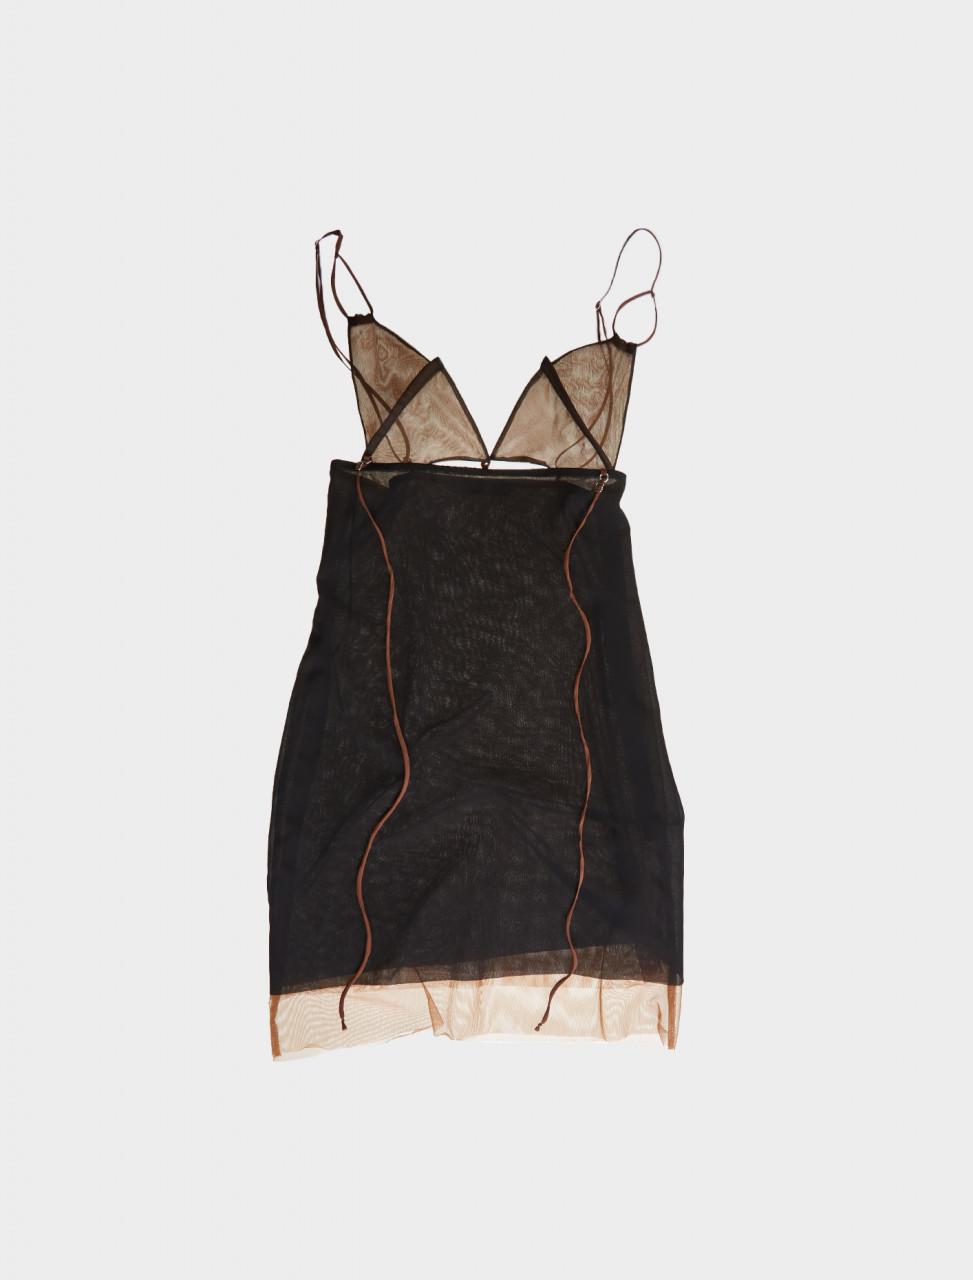 Nensi Dojaka Mini Bra Layered Dress in Black & Nude Front